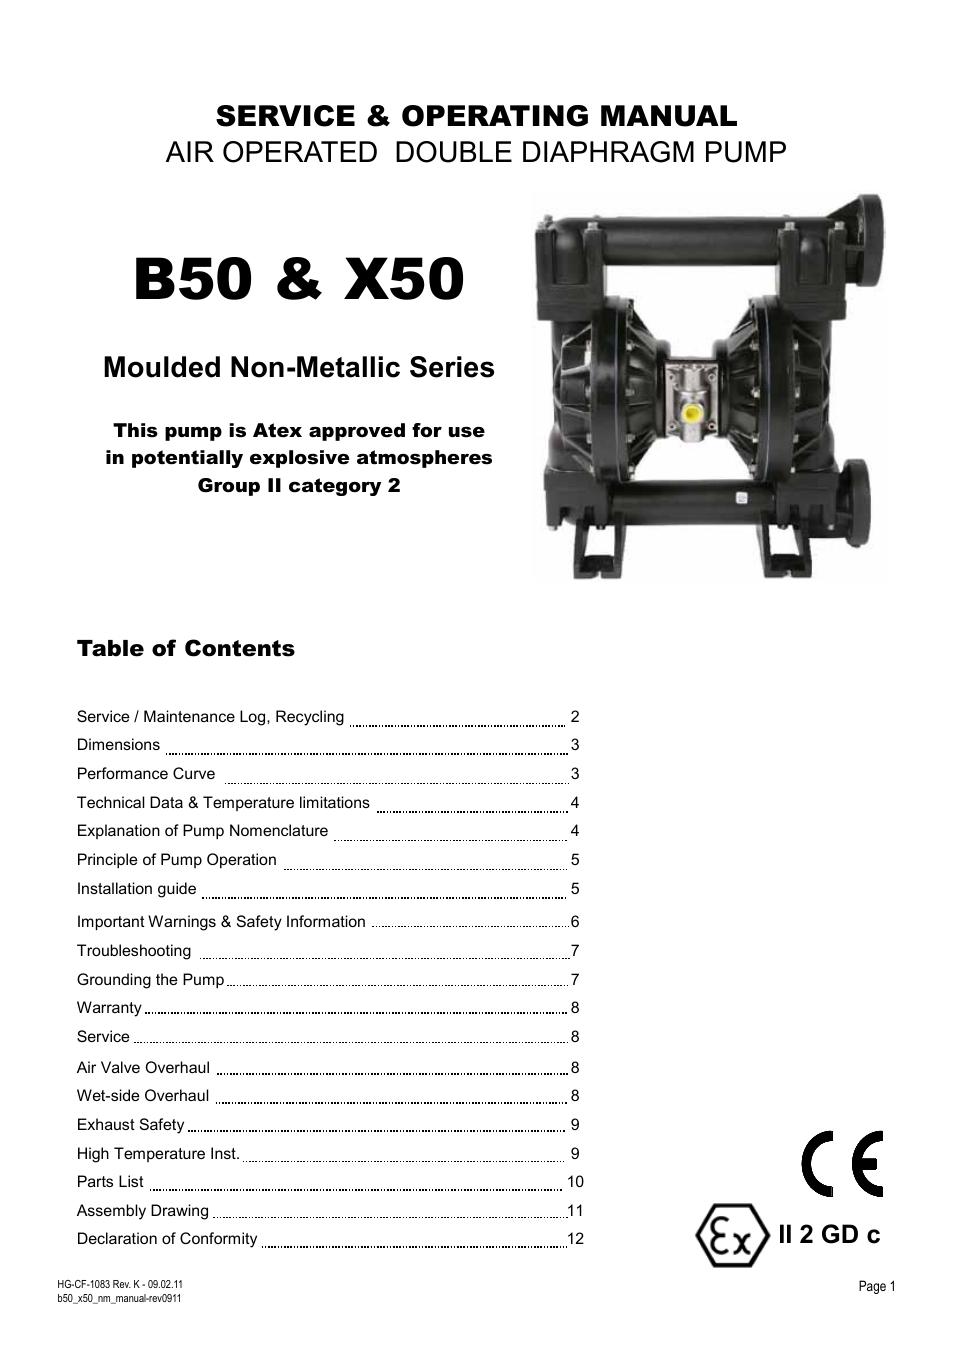 Blagdon pump x50 non metallic user manual 12 pages also for b50 blagdon pump x50 non metallic user manual 12 pages also for b50 non metallic ccuart Images